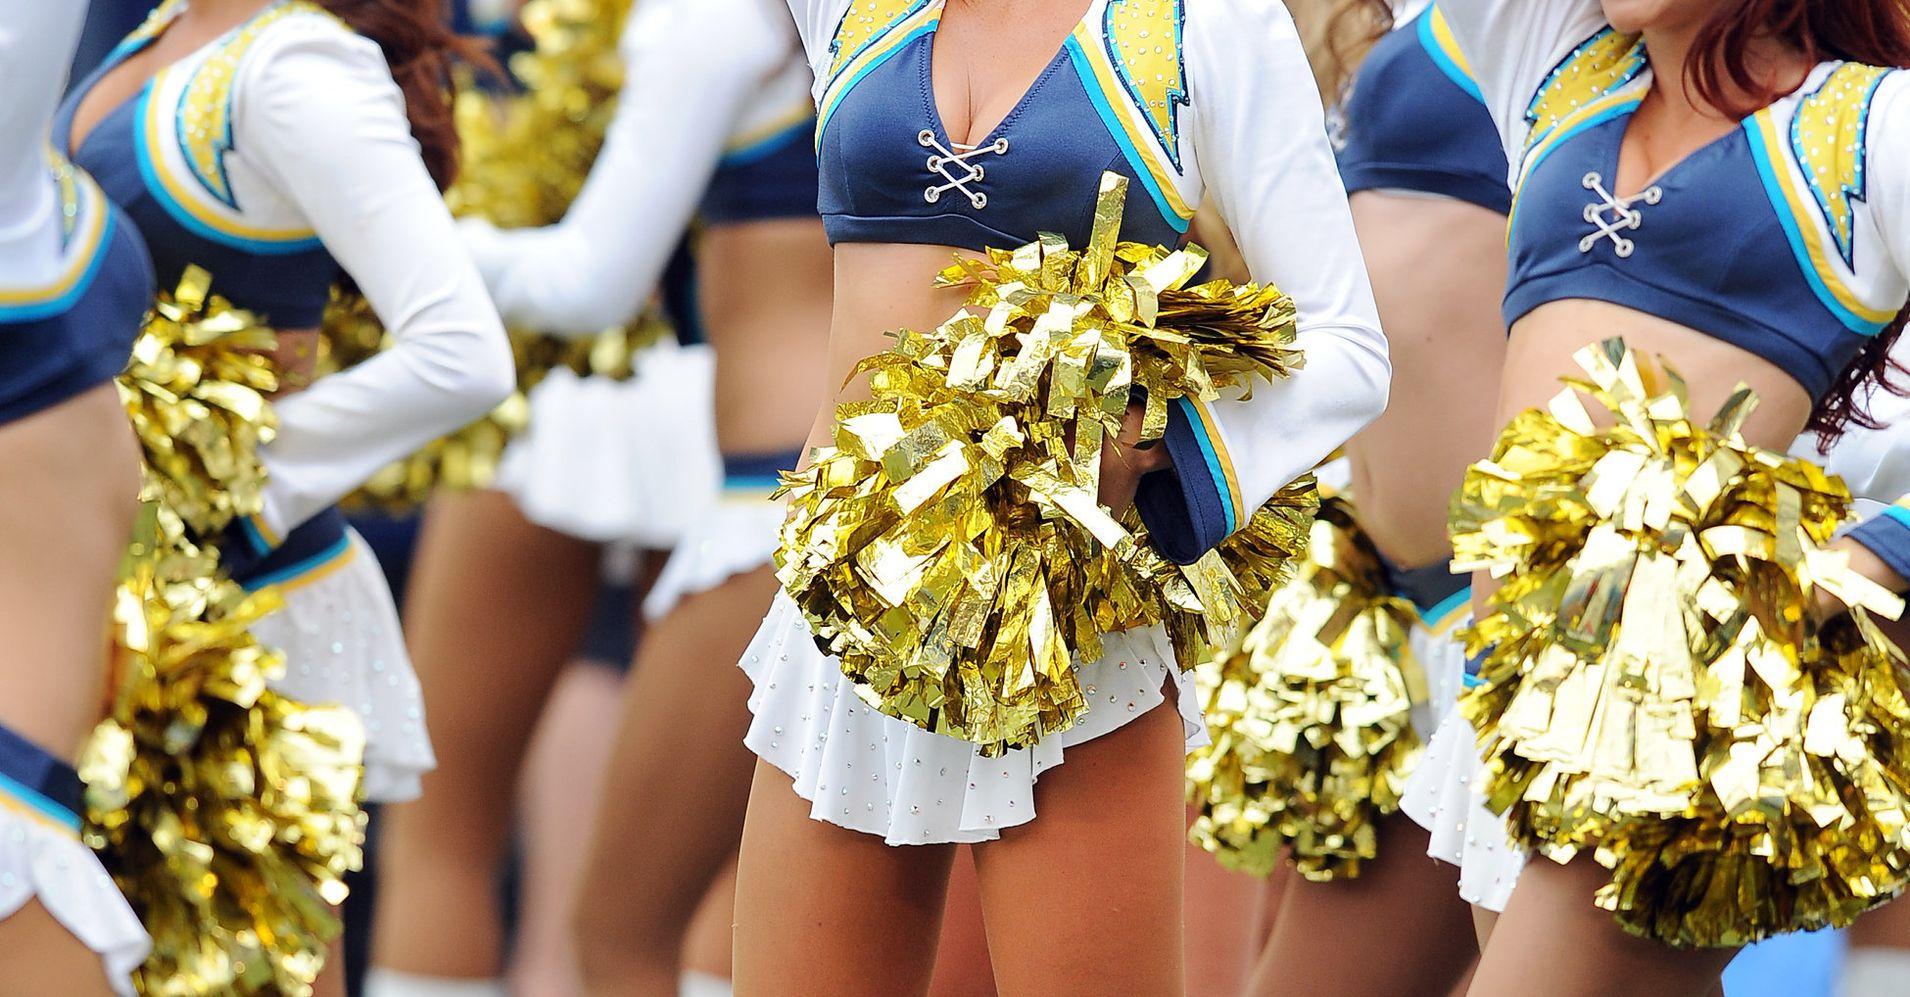 cheerleaders-masterbating-pics-pussy-tight-tits